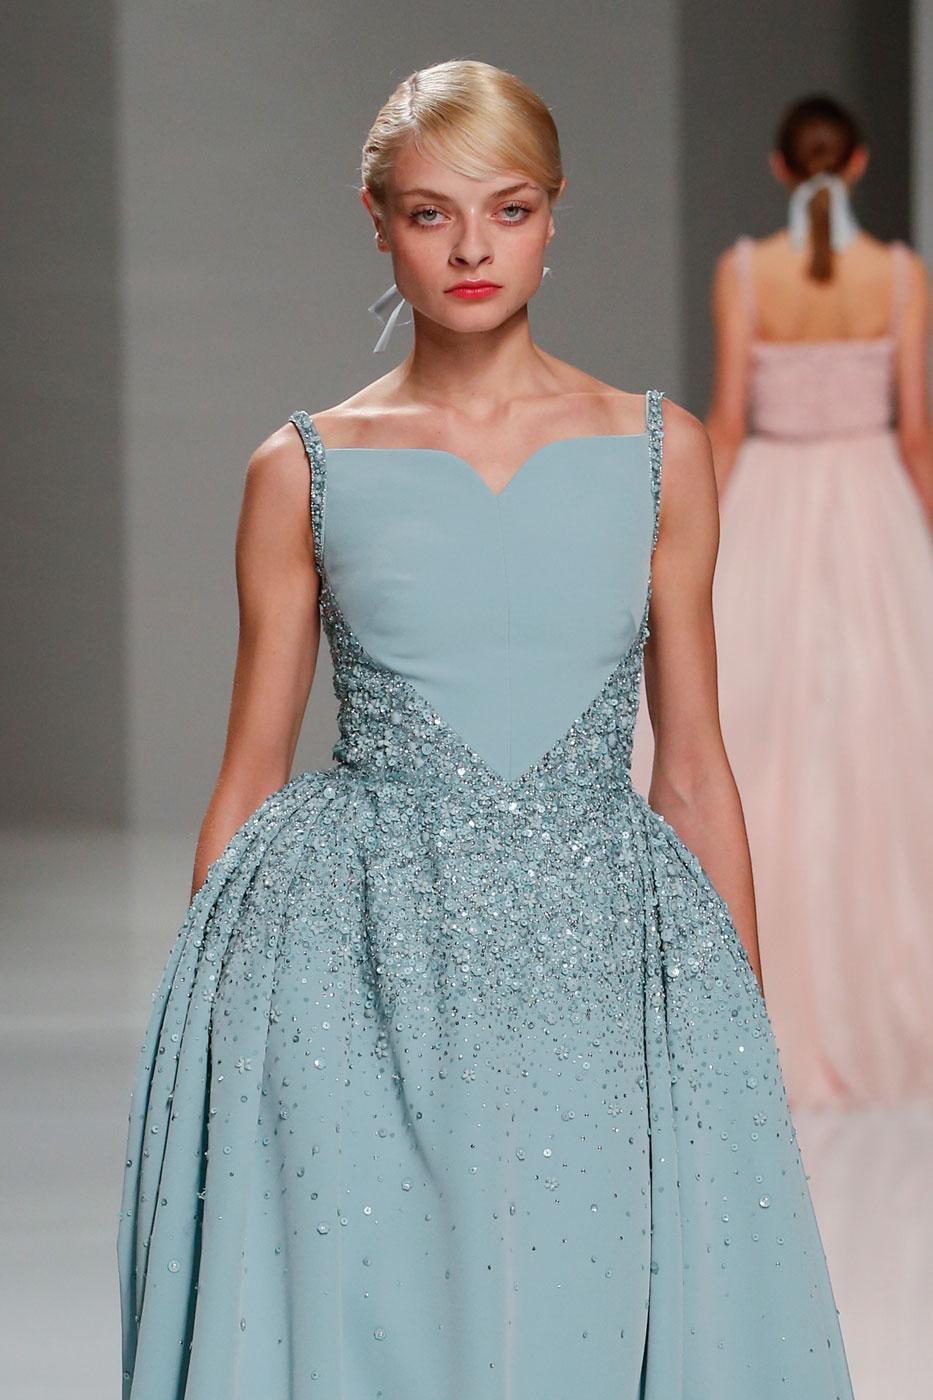 Georges-Hobeika-fashion-runway-show-haute-couture-paris-spring-2015-the-impression-46